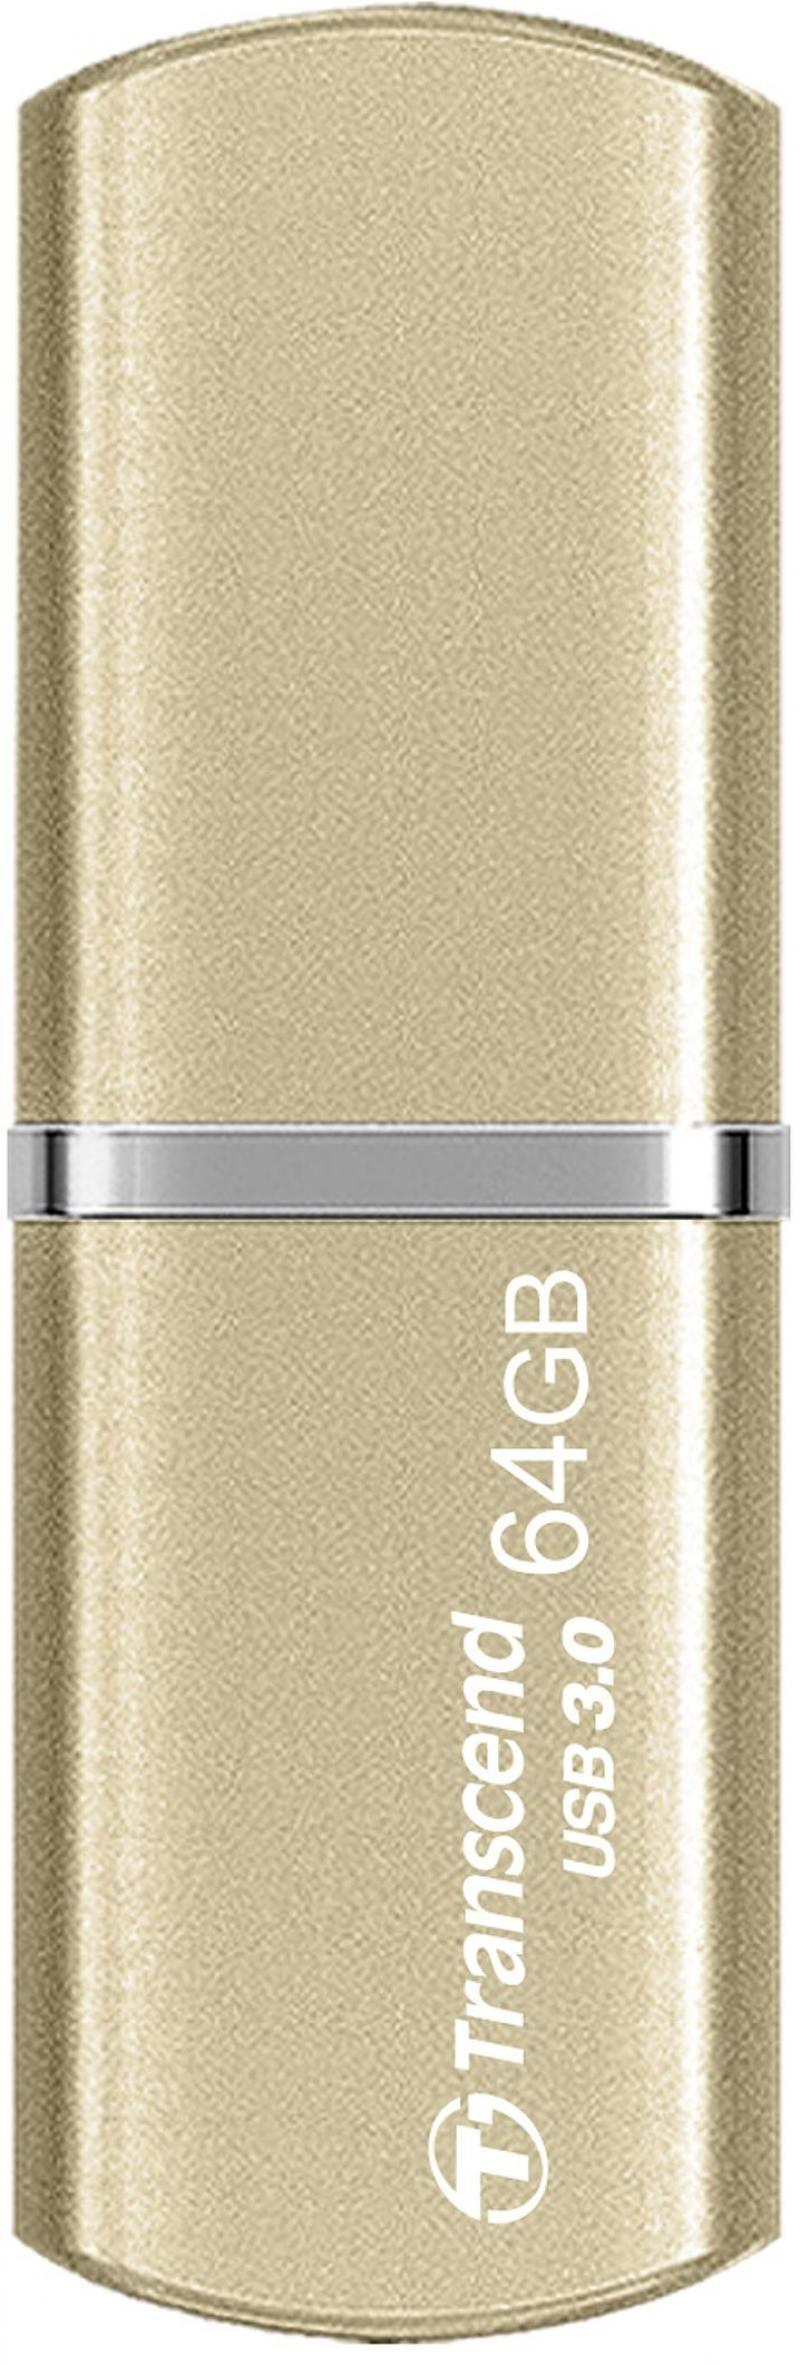 Флешка USB 64Gb Transcend Jetflash 820G USB3.0 TS64GJF820G золотистый usb накопитель 64gb transcend jetflash 530 ts64gjf530